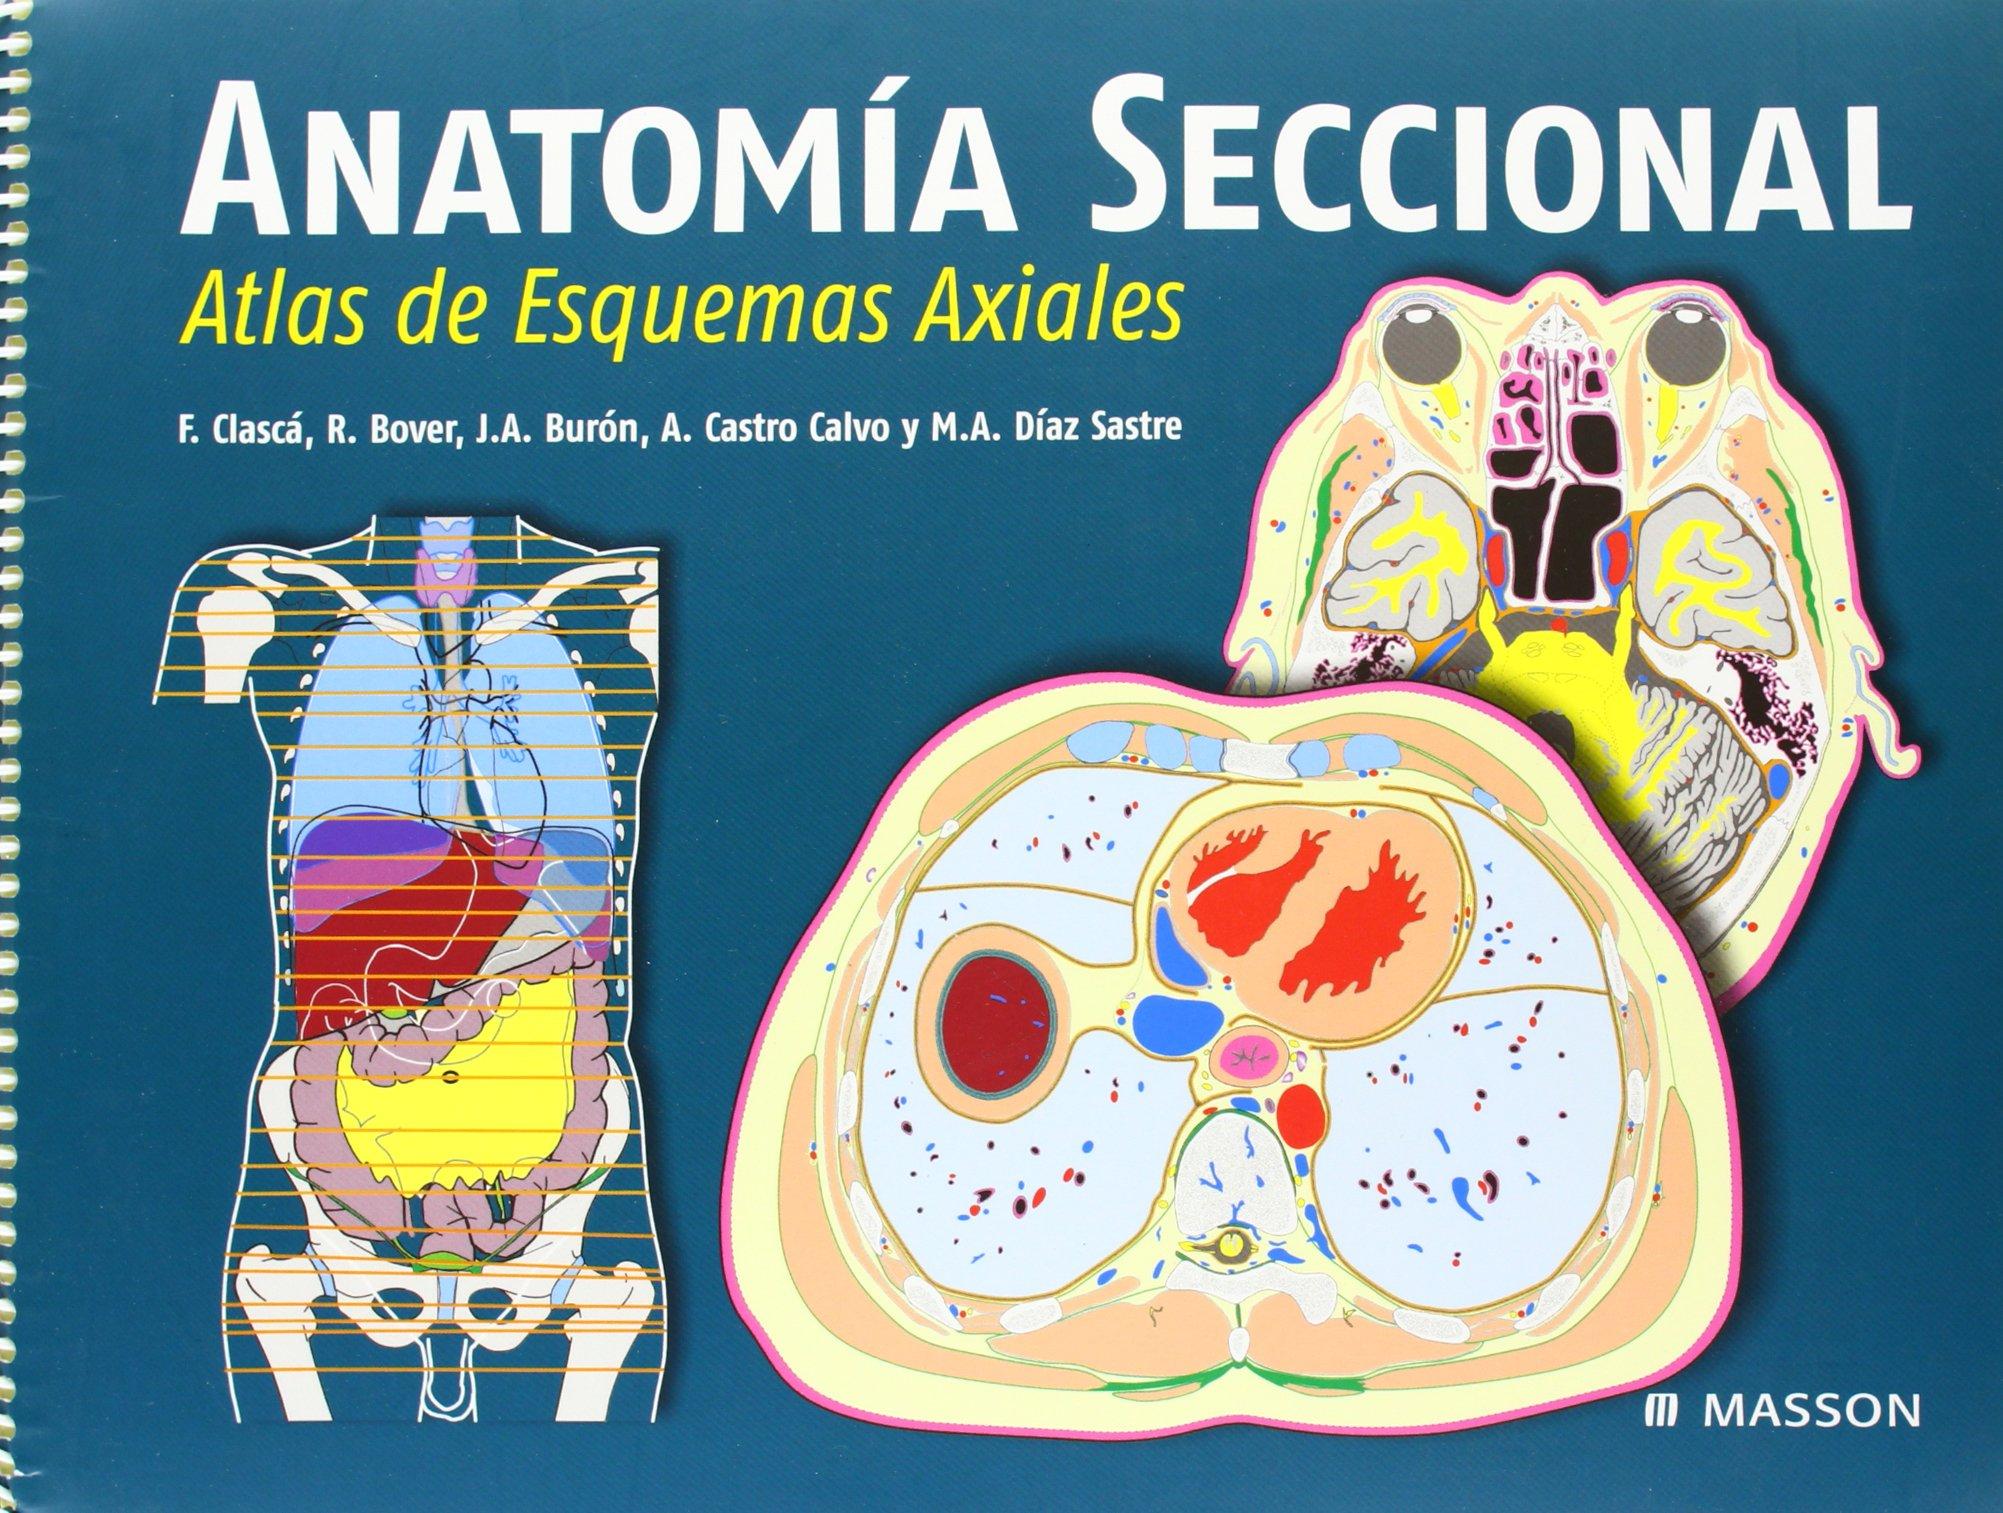 Anatomia seccional. guia de referencia: Amazon.es: Clasca, Bover ...